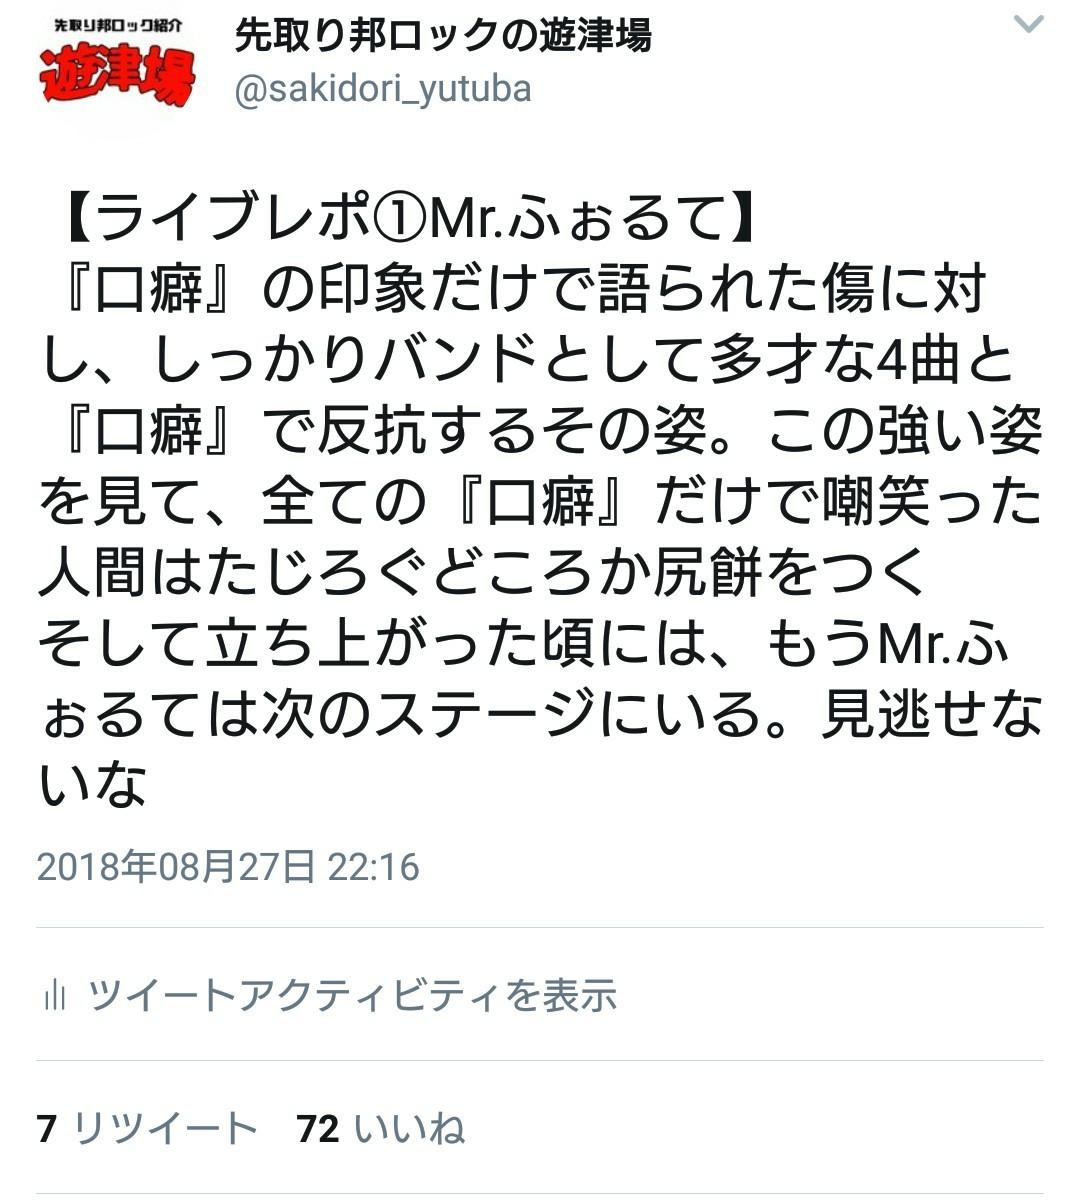 f:id:sakidoriyutsubarock:20181219213322j:plain